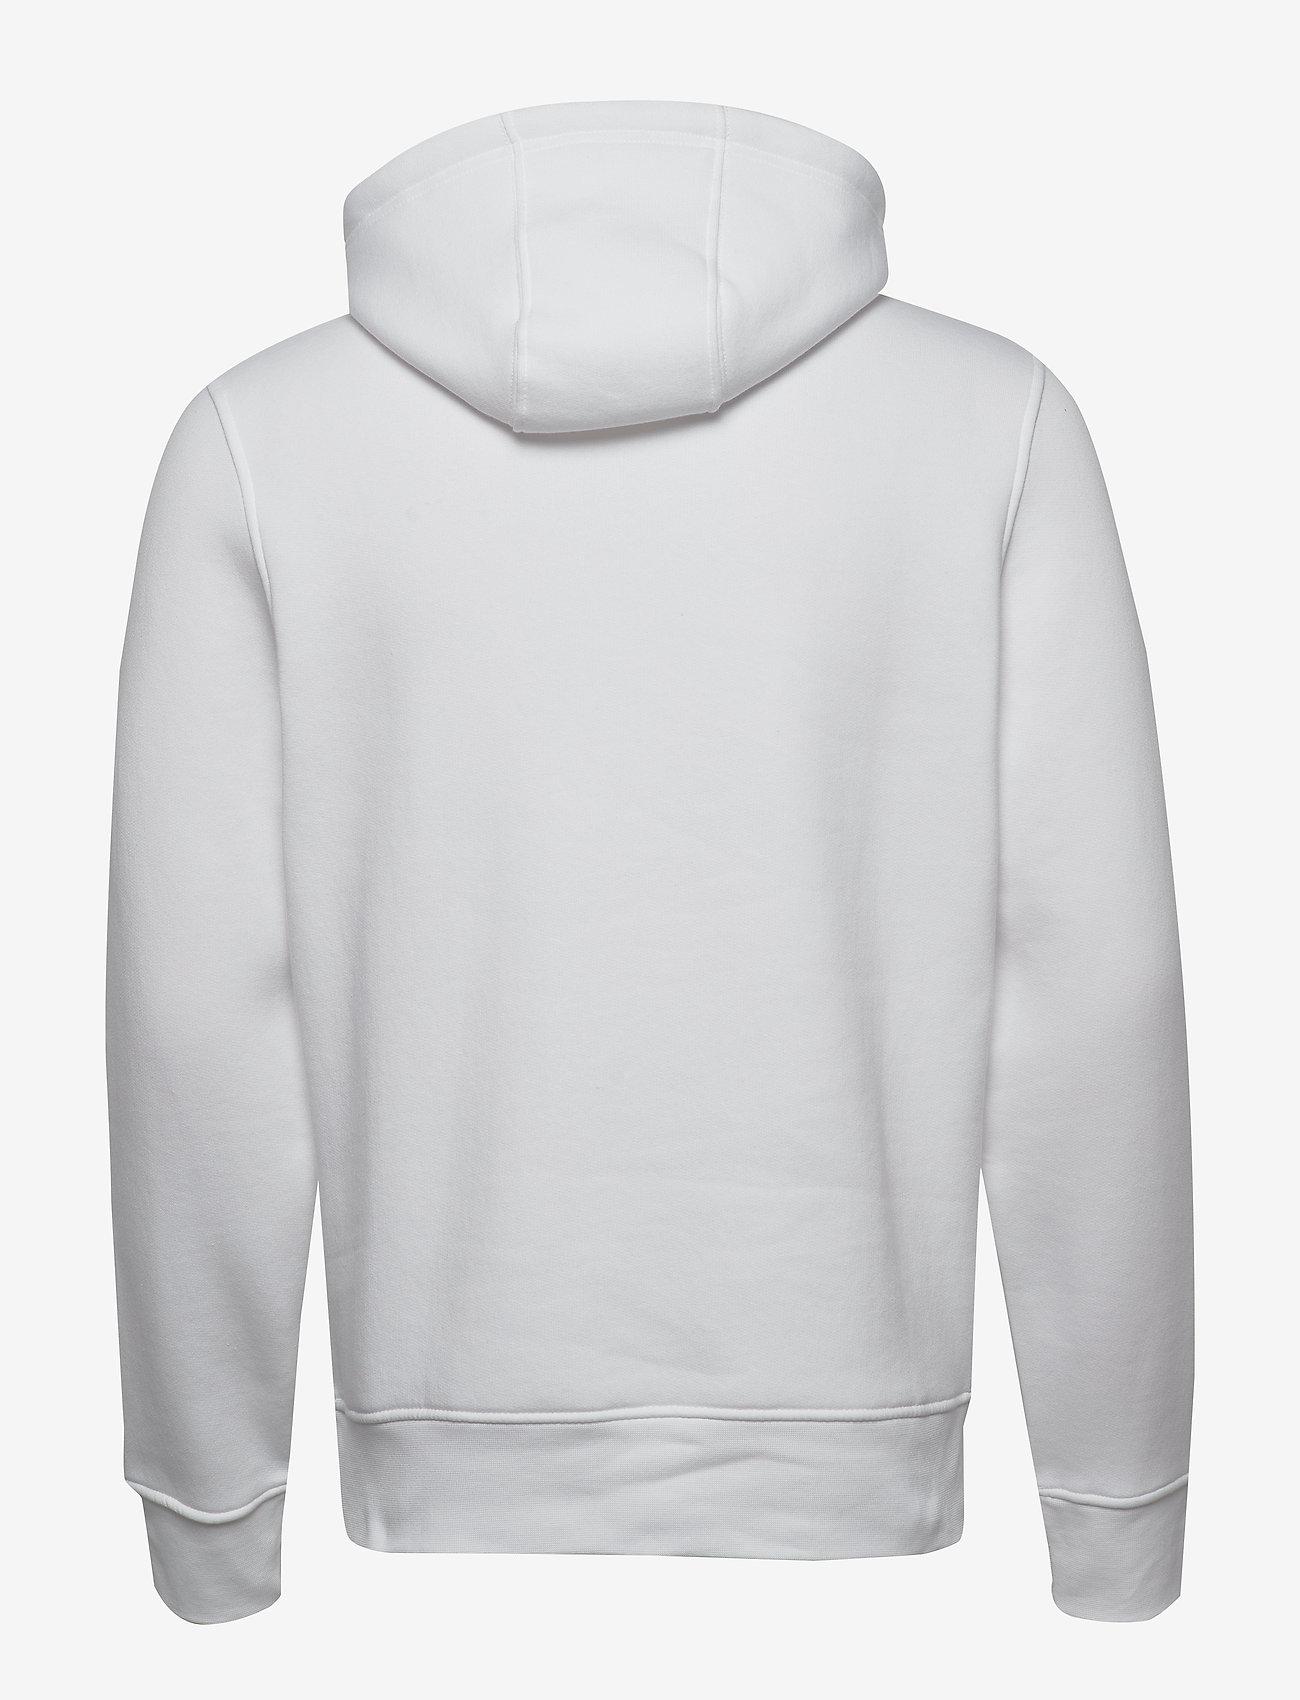 Tommy Hilfiger - TOMMY FLAG HILFIGER HOODY - hoodies - white - 1